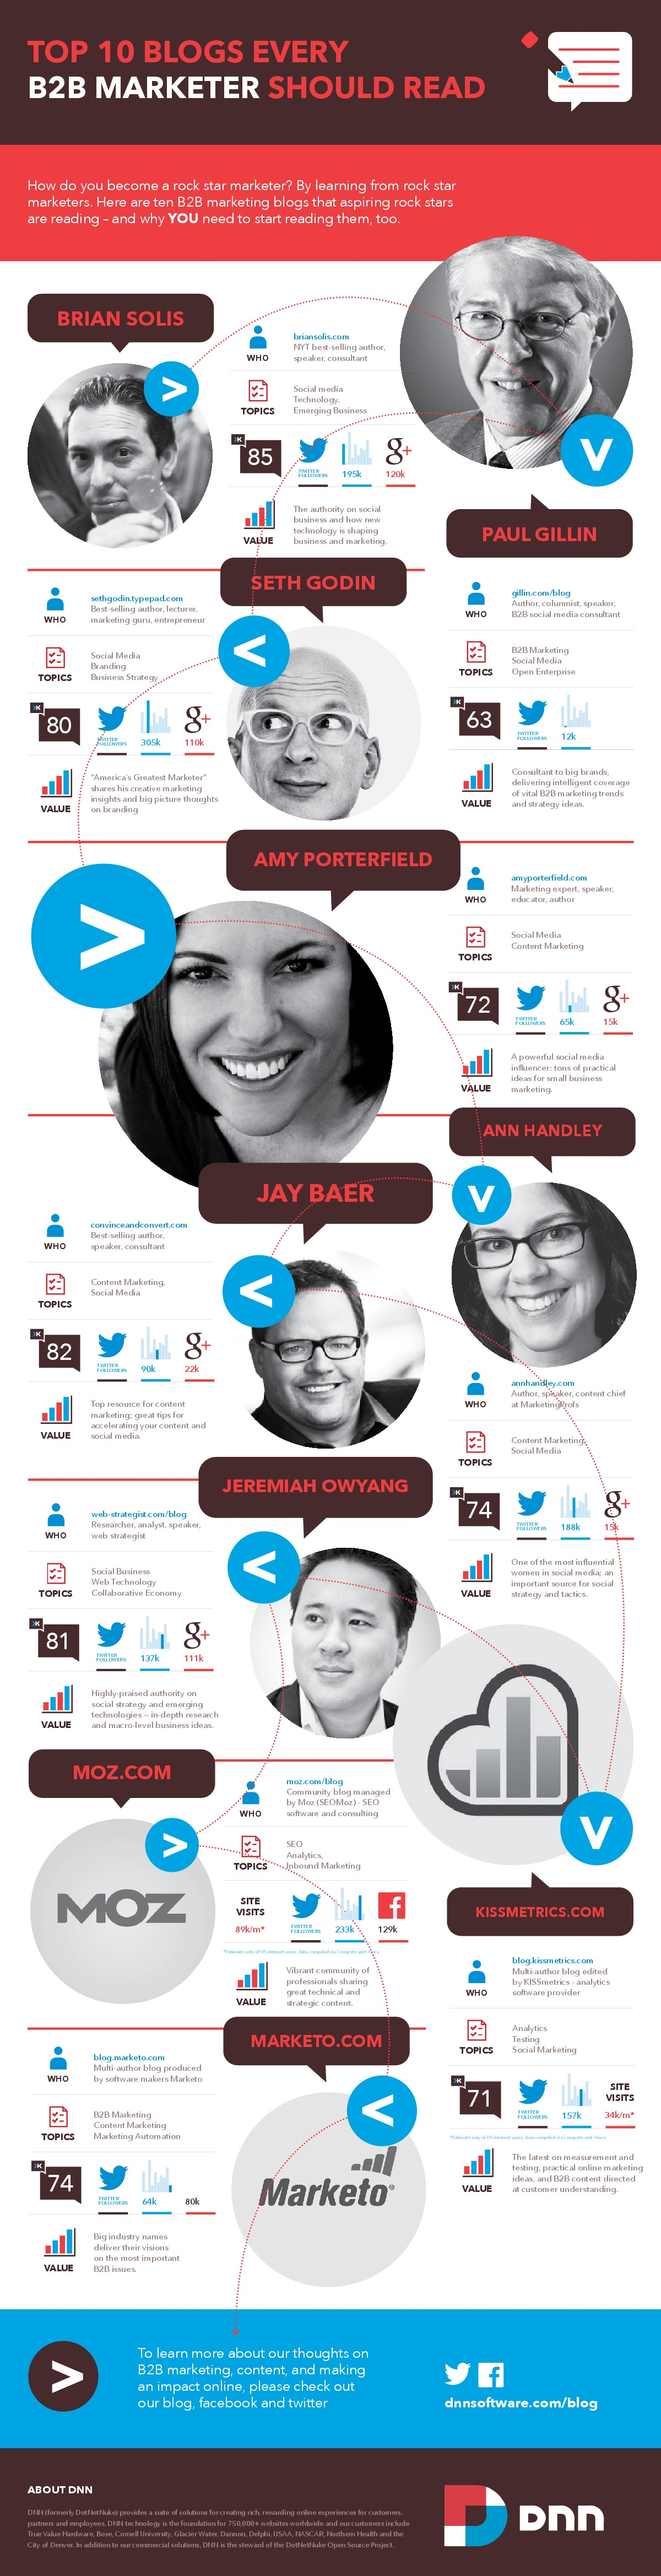 top-ten-blogs-every-marketer-should-read_5257feb797532